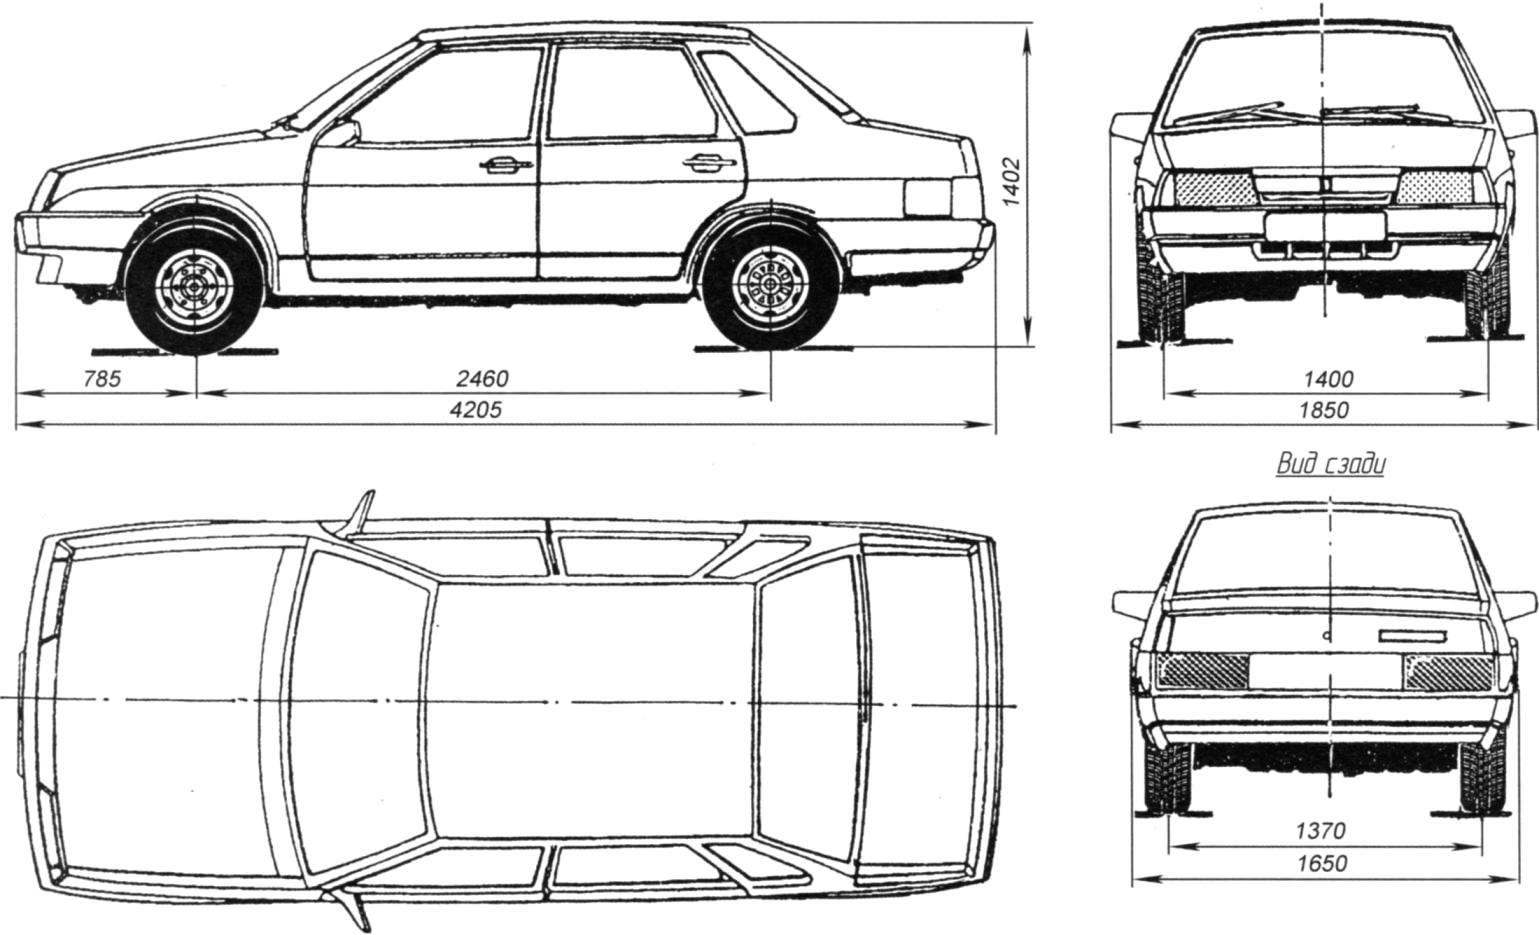 Габаритные размеры ВАЗ-21099 (4-дверный седан)